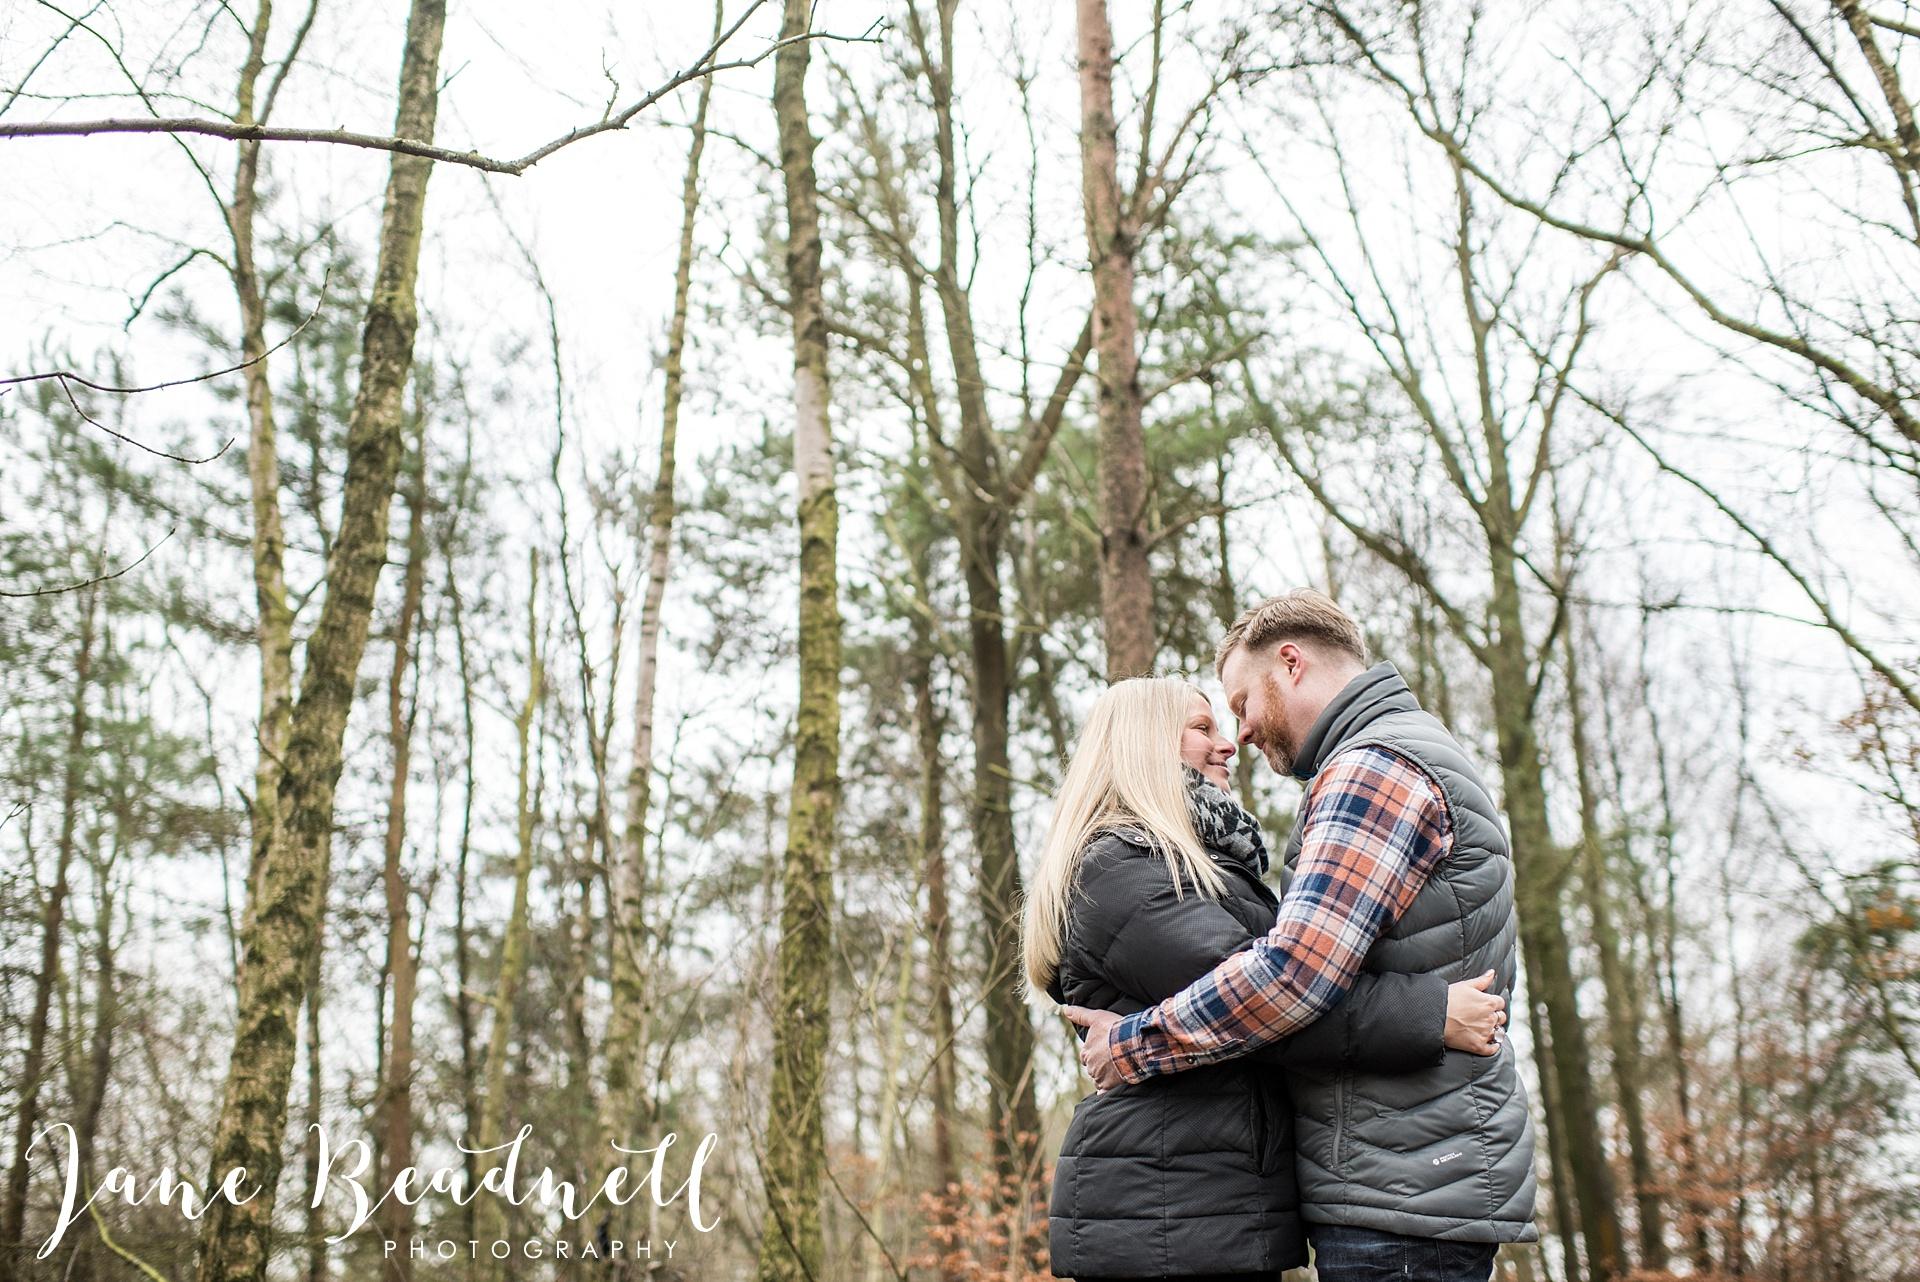 yorkshire-wedding-photographer-jane-beadnell-photography-uk-and-destination-wedding-photographer-engagement-shoot_0020